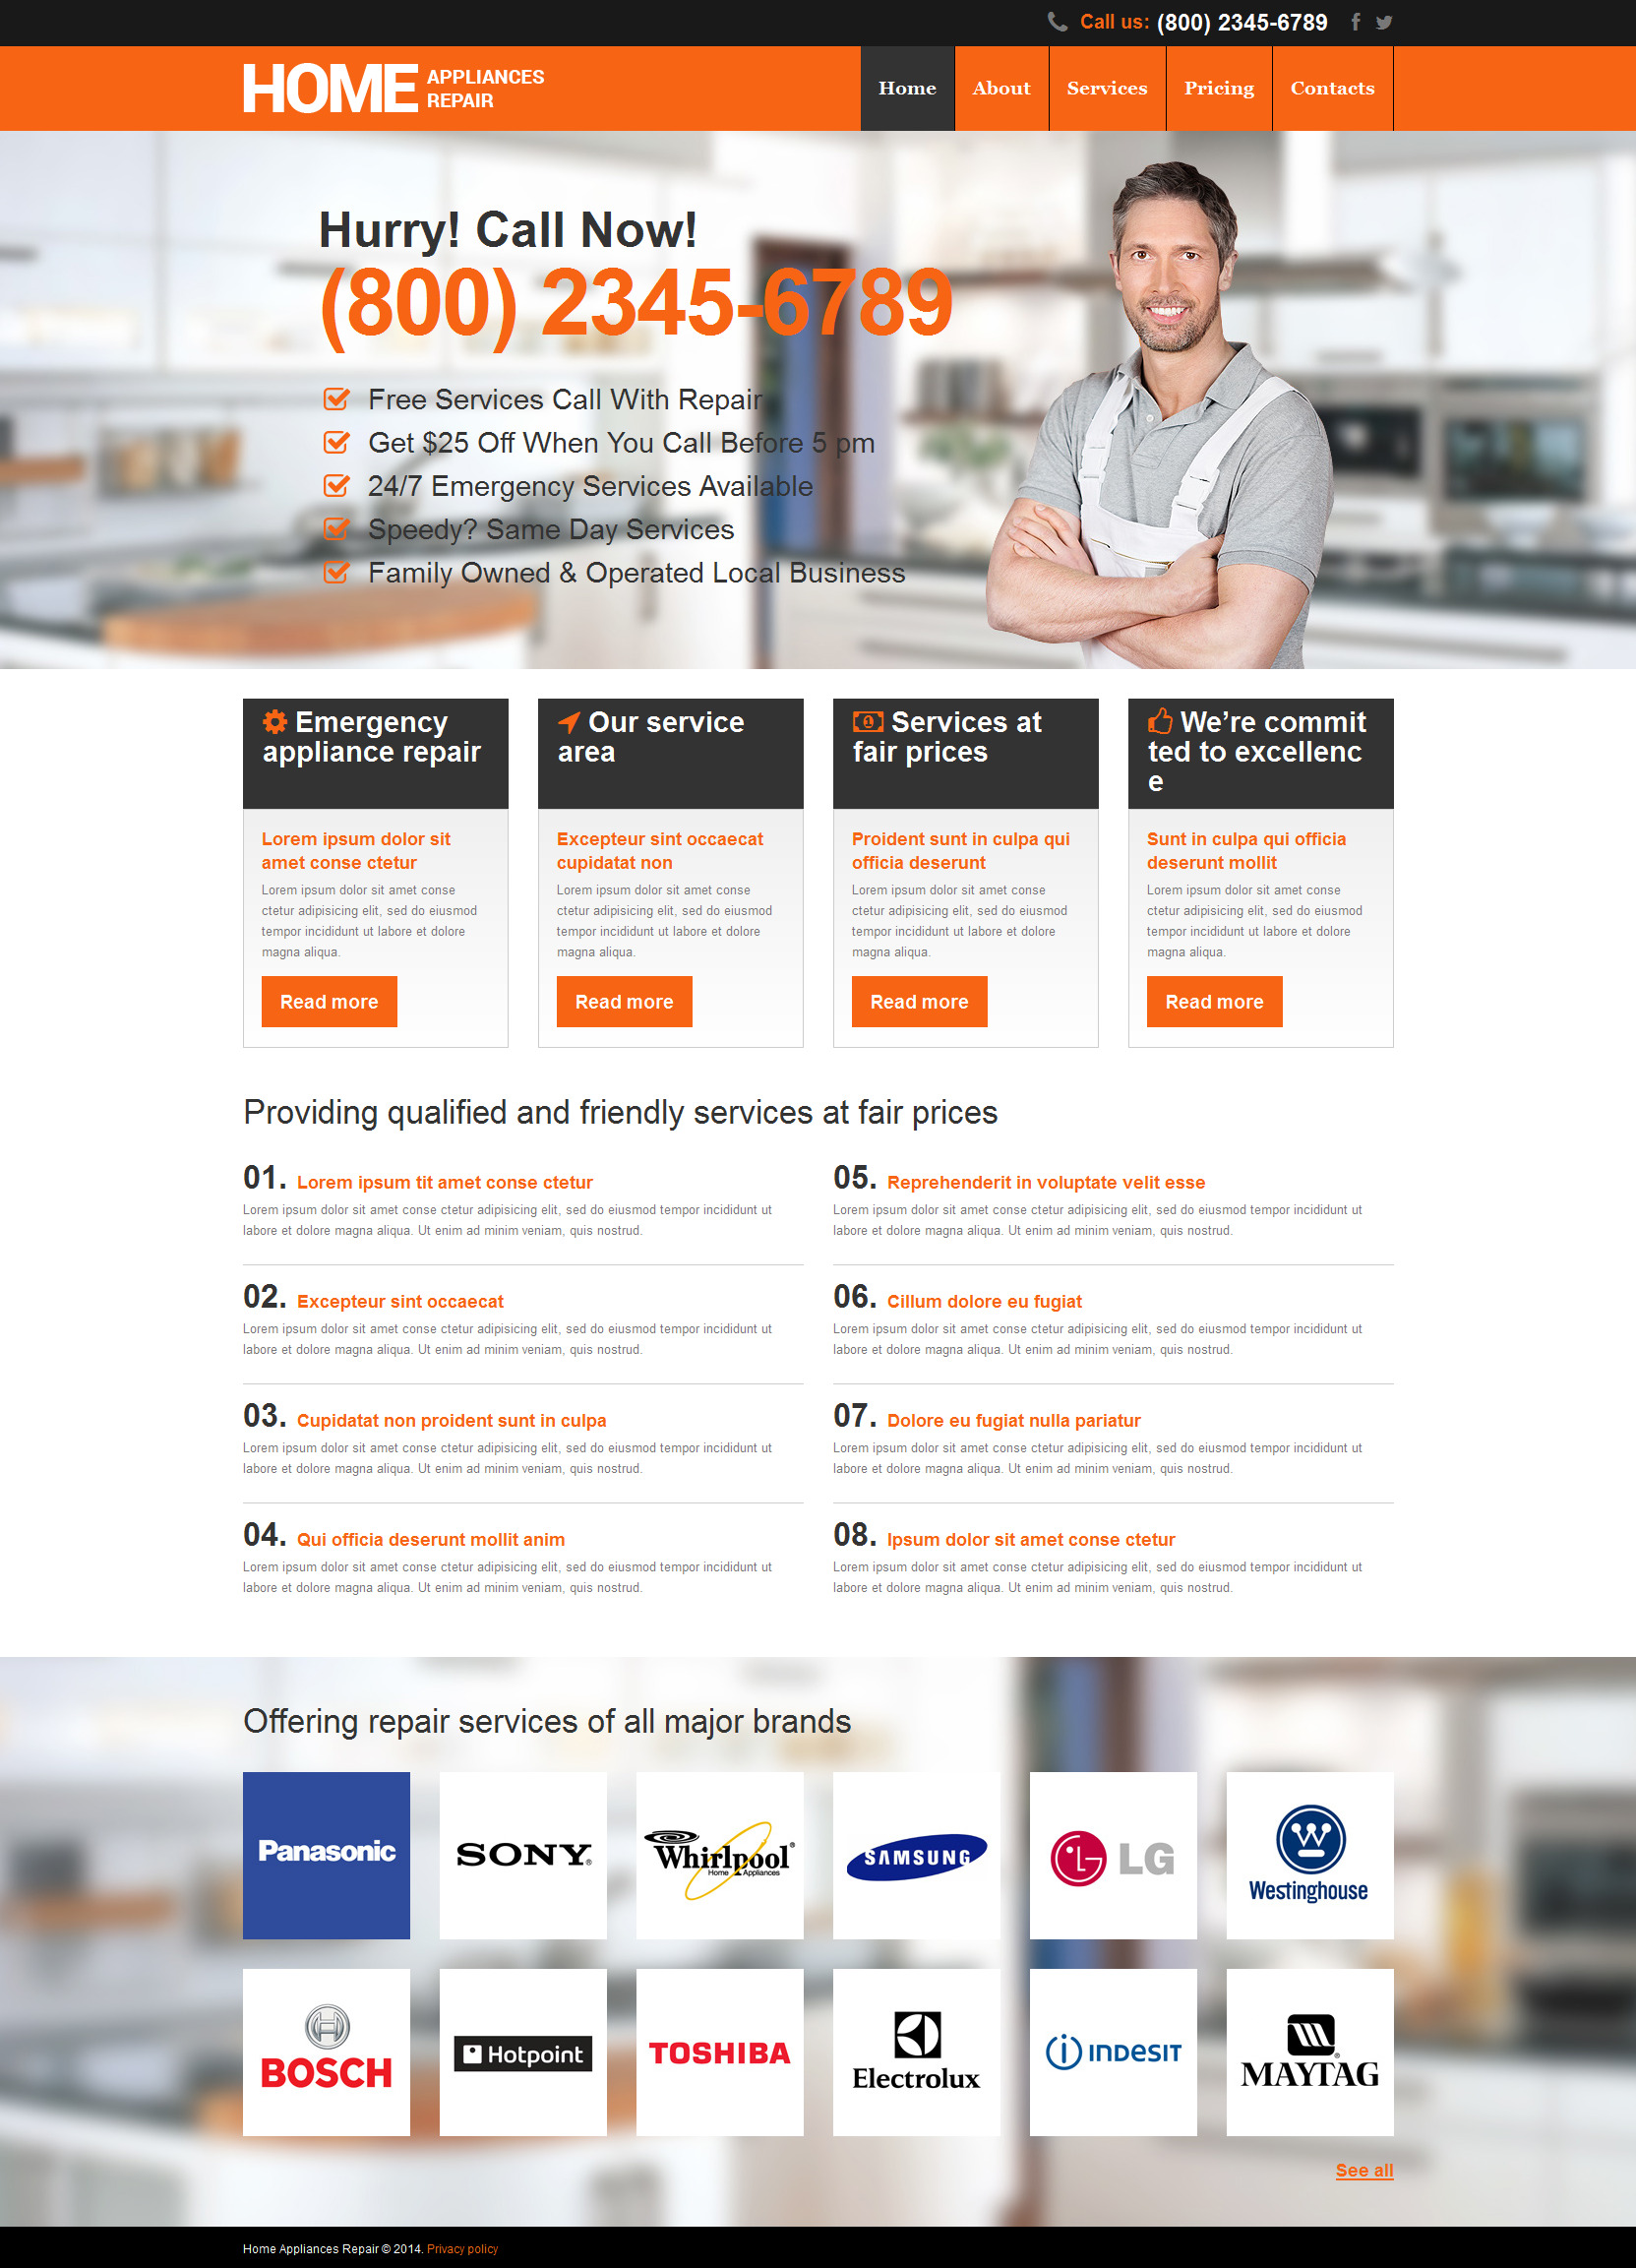 Home Repairs Responsive Website Template